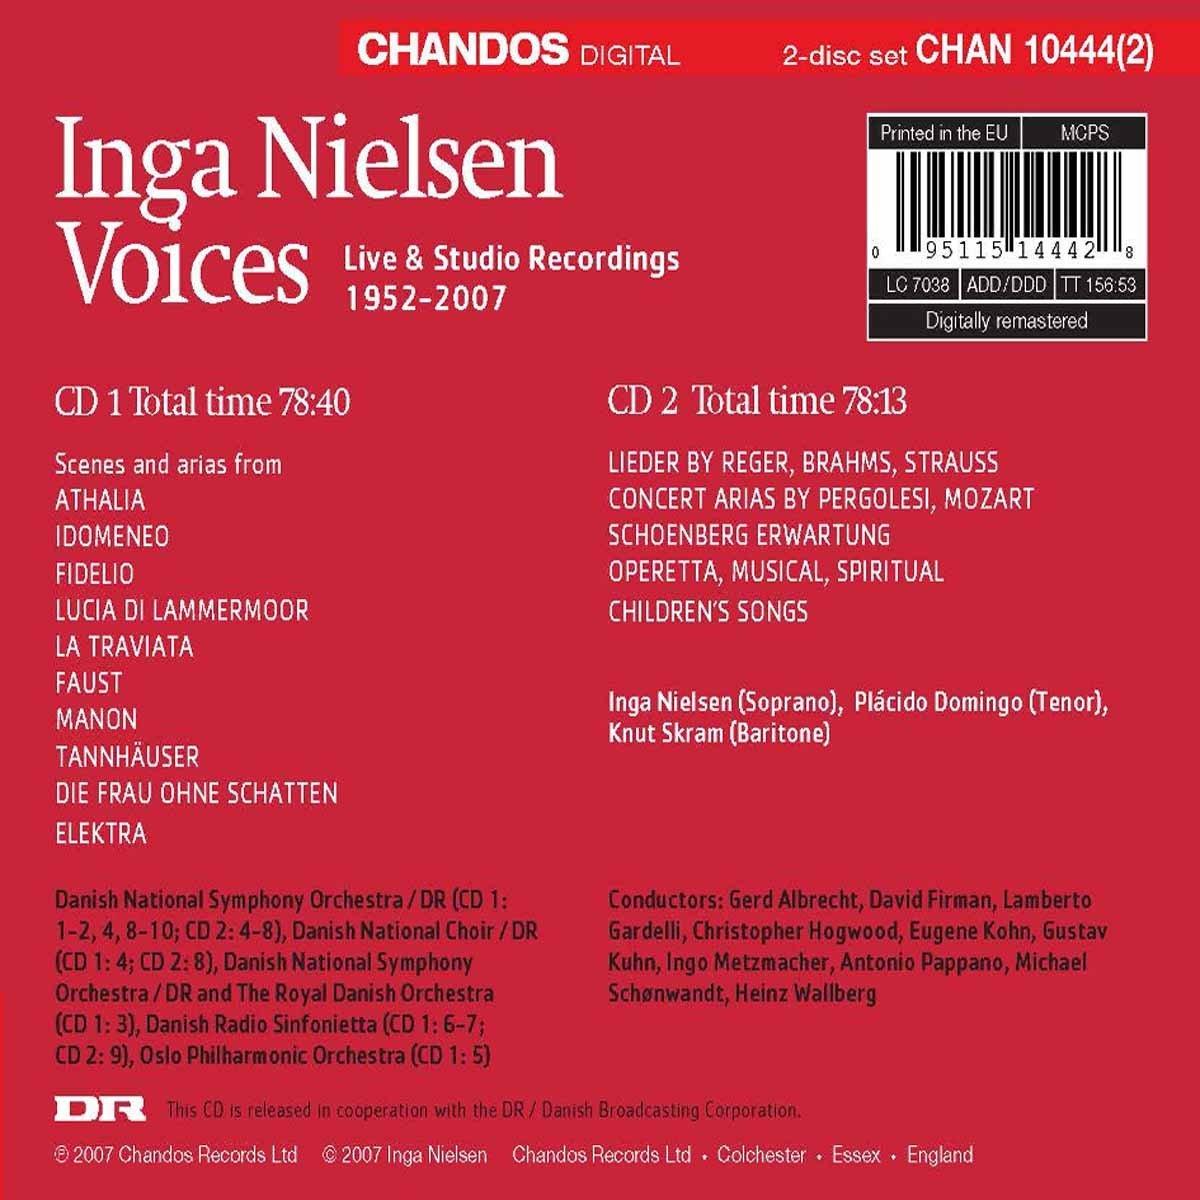 Voices: Live & Studio Recordings 1952-2007